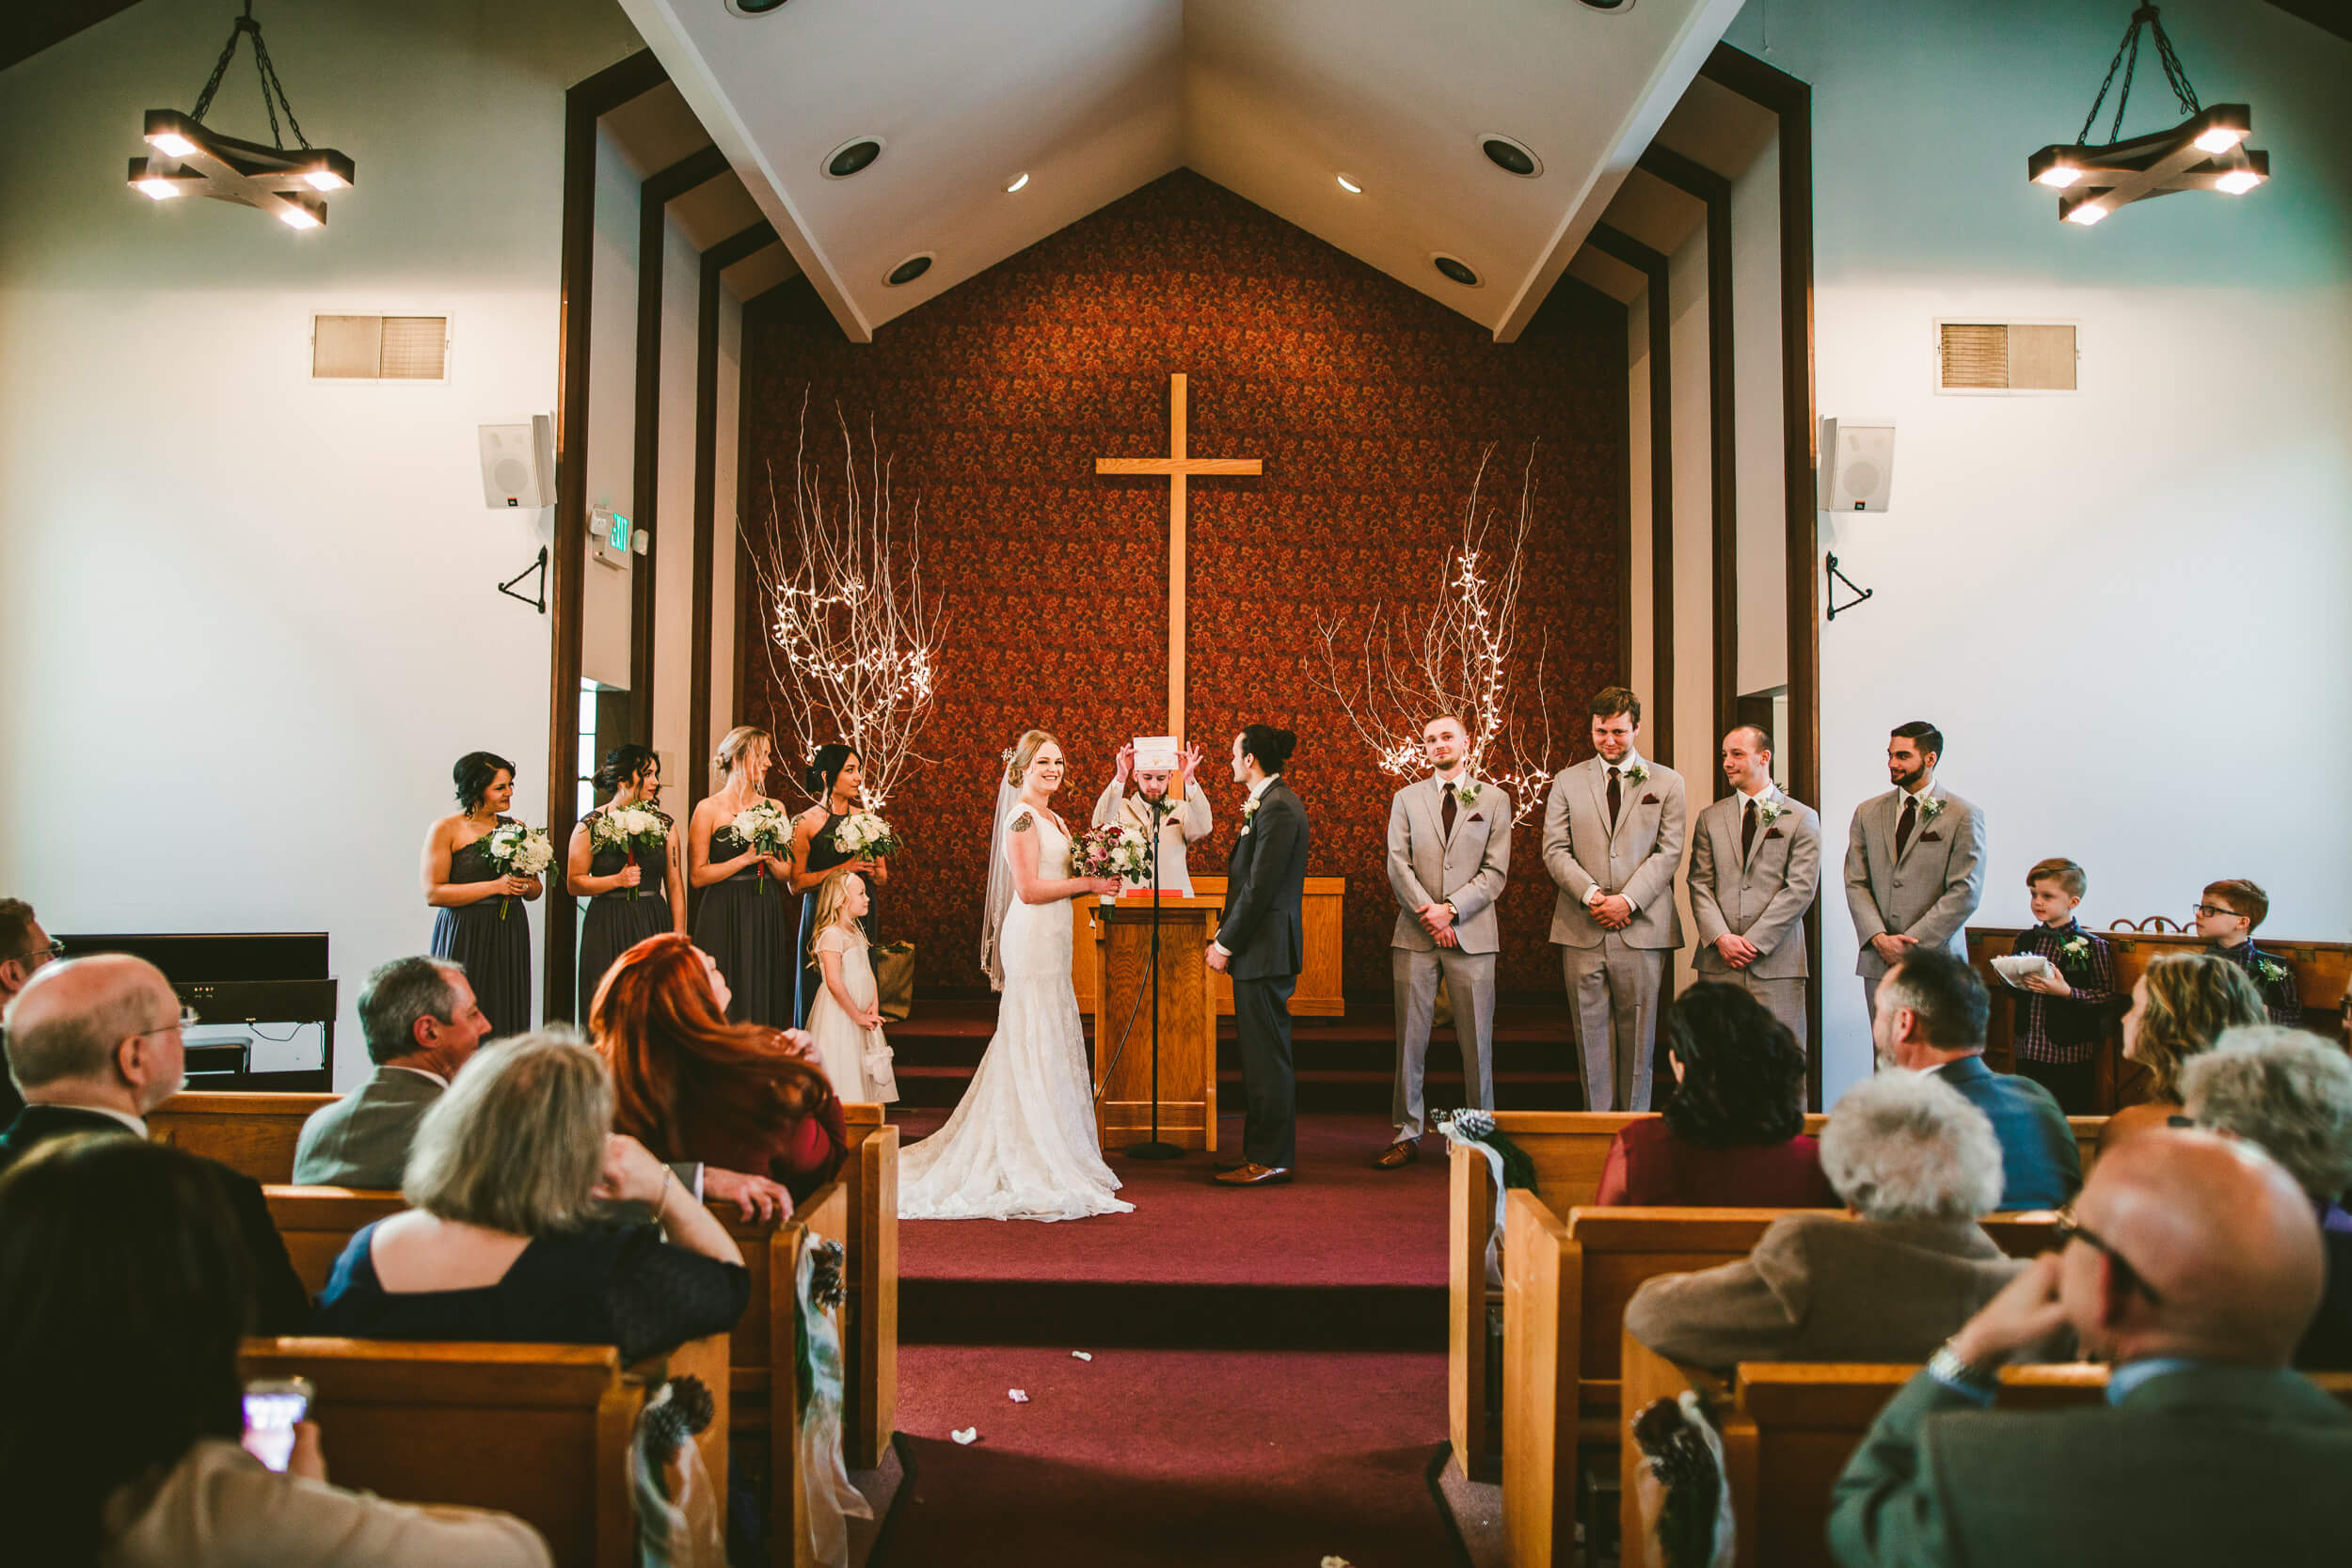 mukogawa winter wedding in spokane (155).jpg